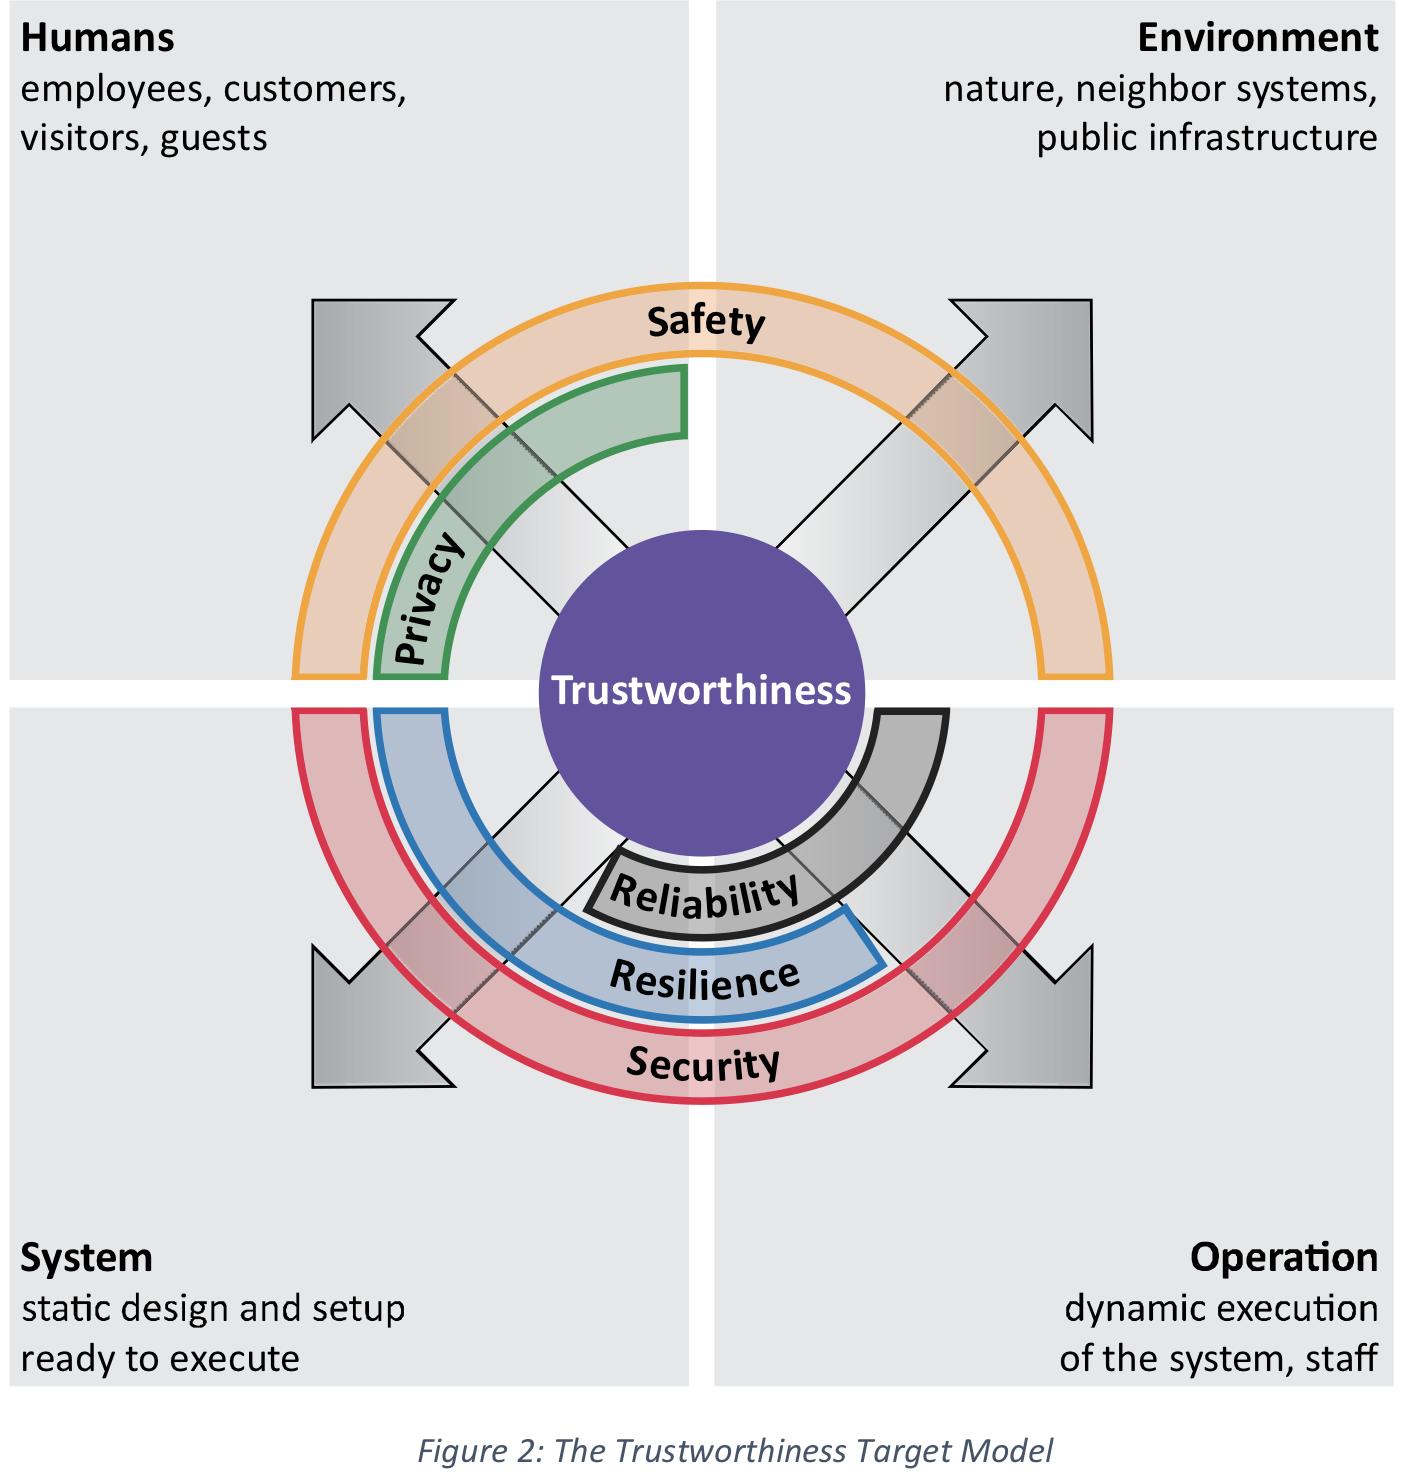 The trustworthiness Target Model